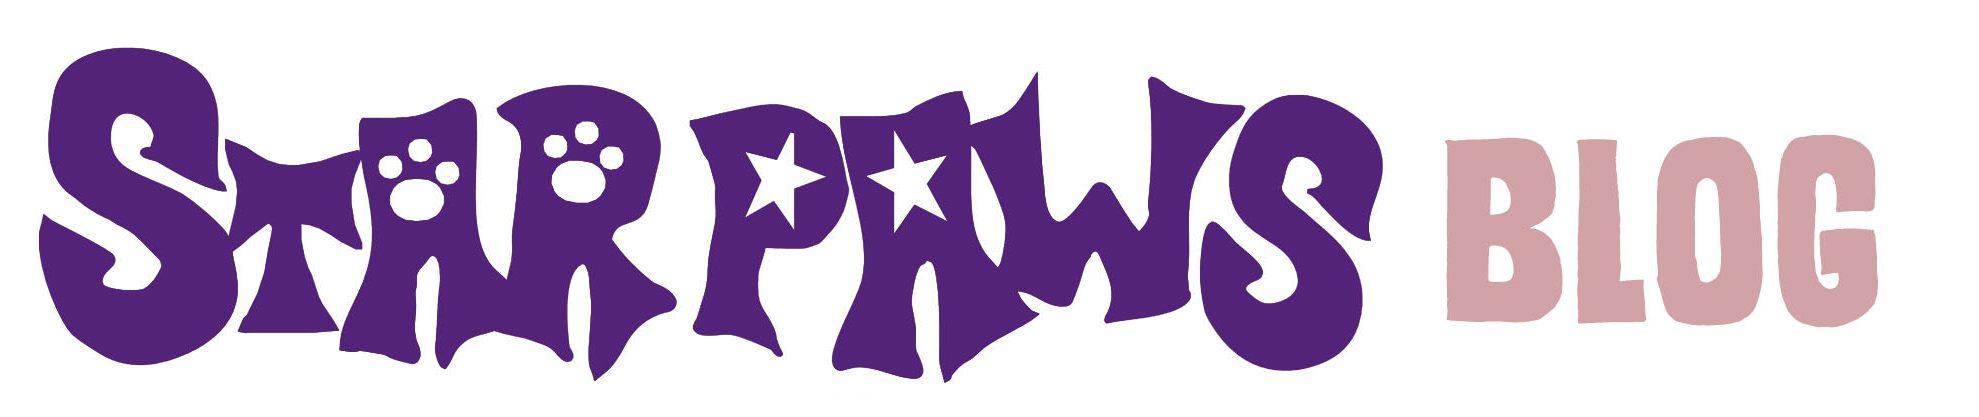 Star Paws Blog